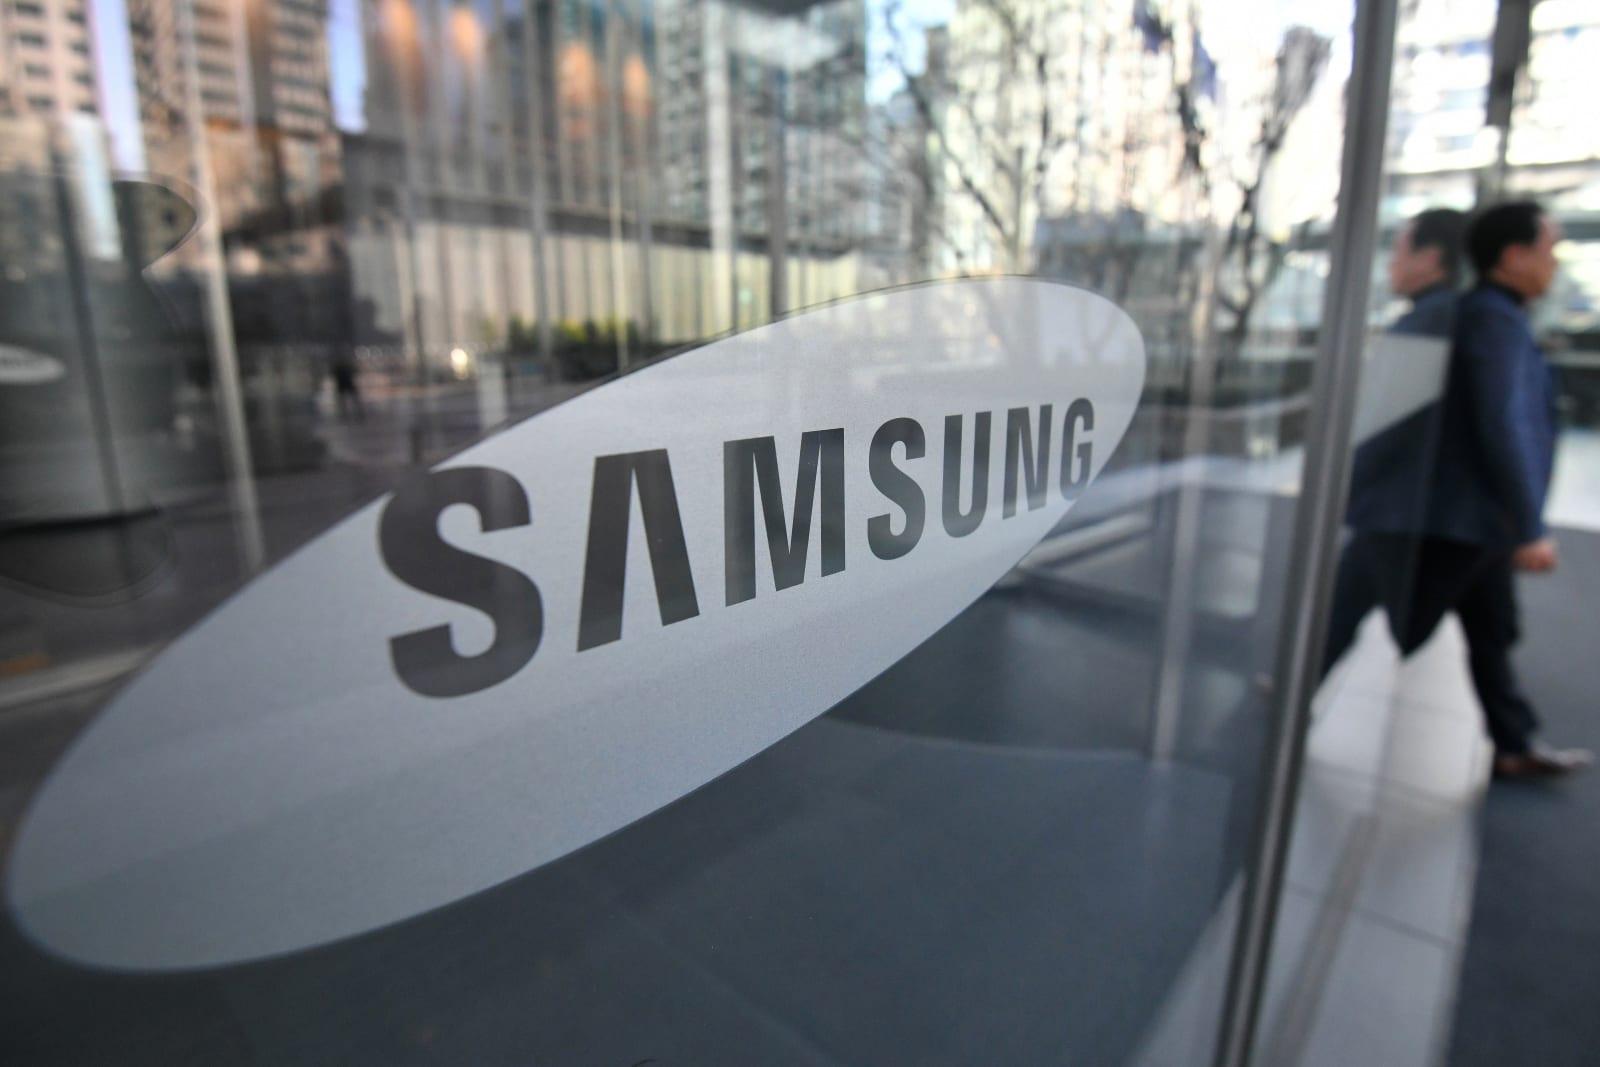 Samsung leak exposed source code, passwords and employee data